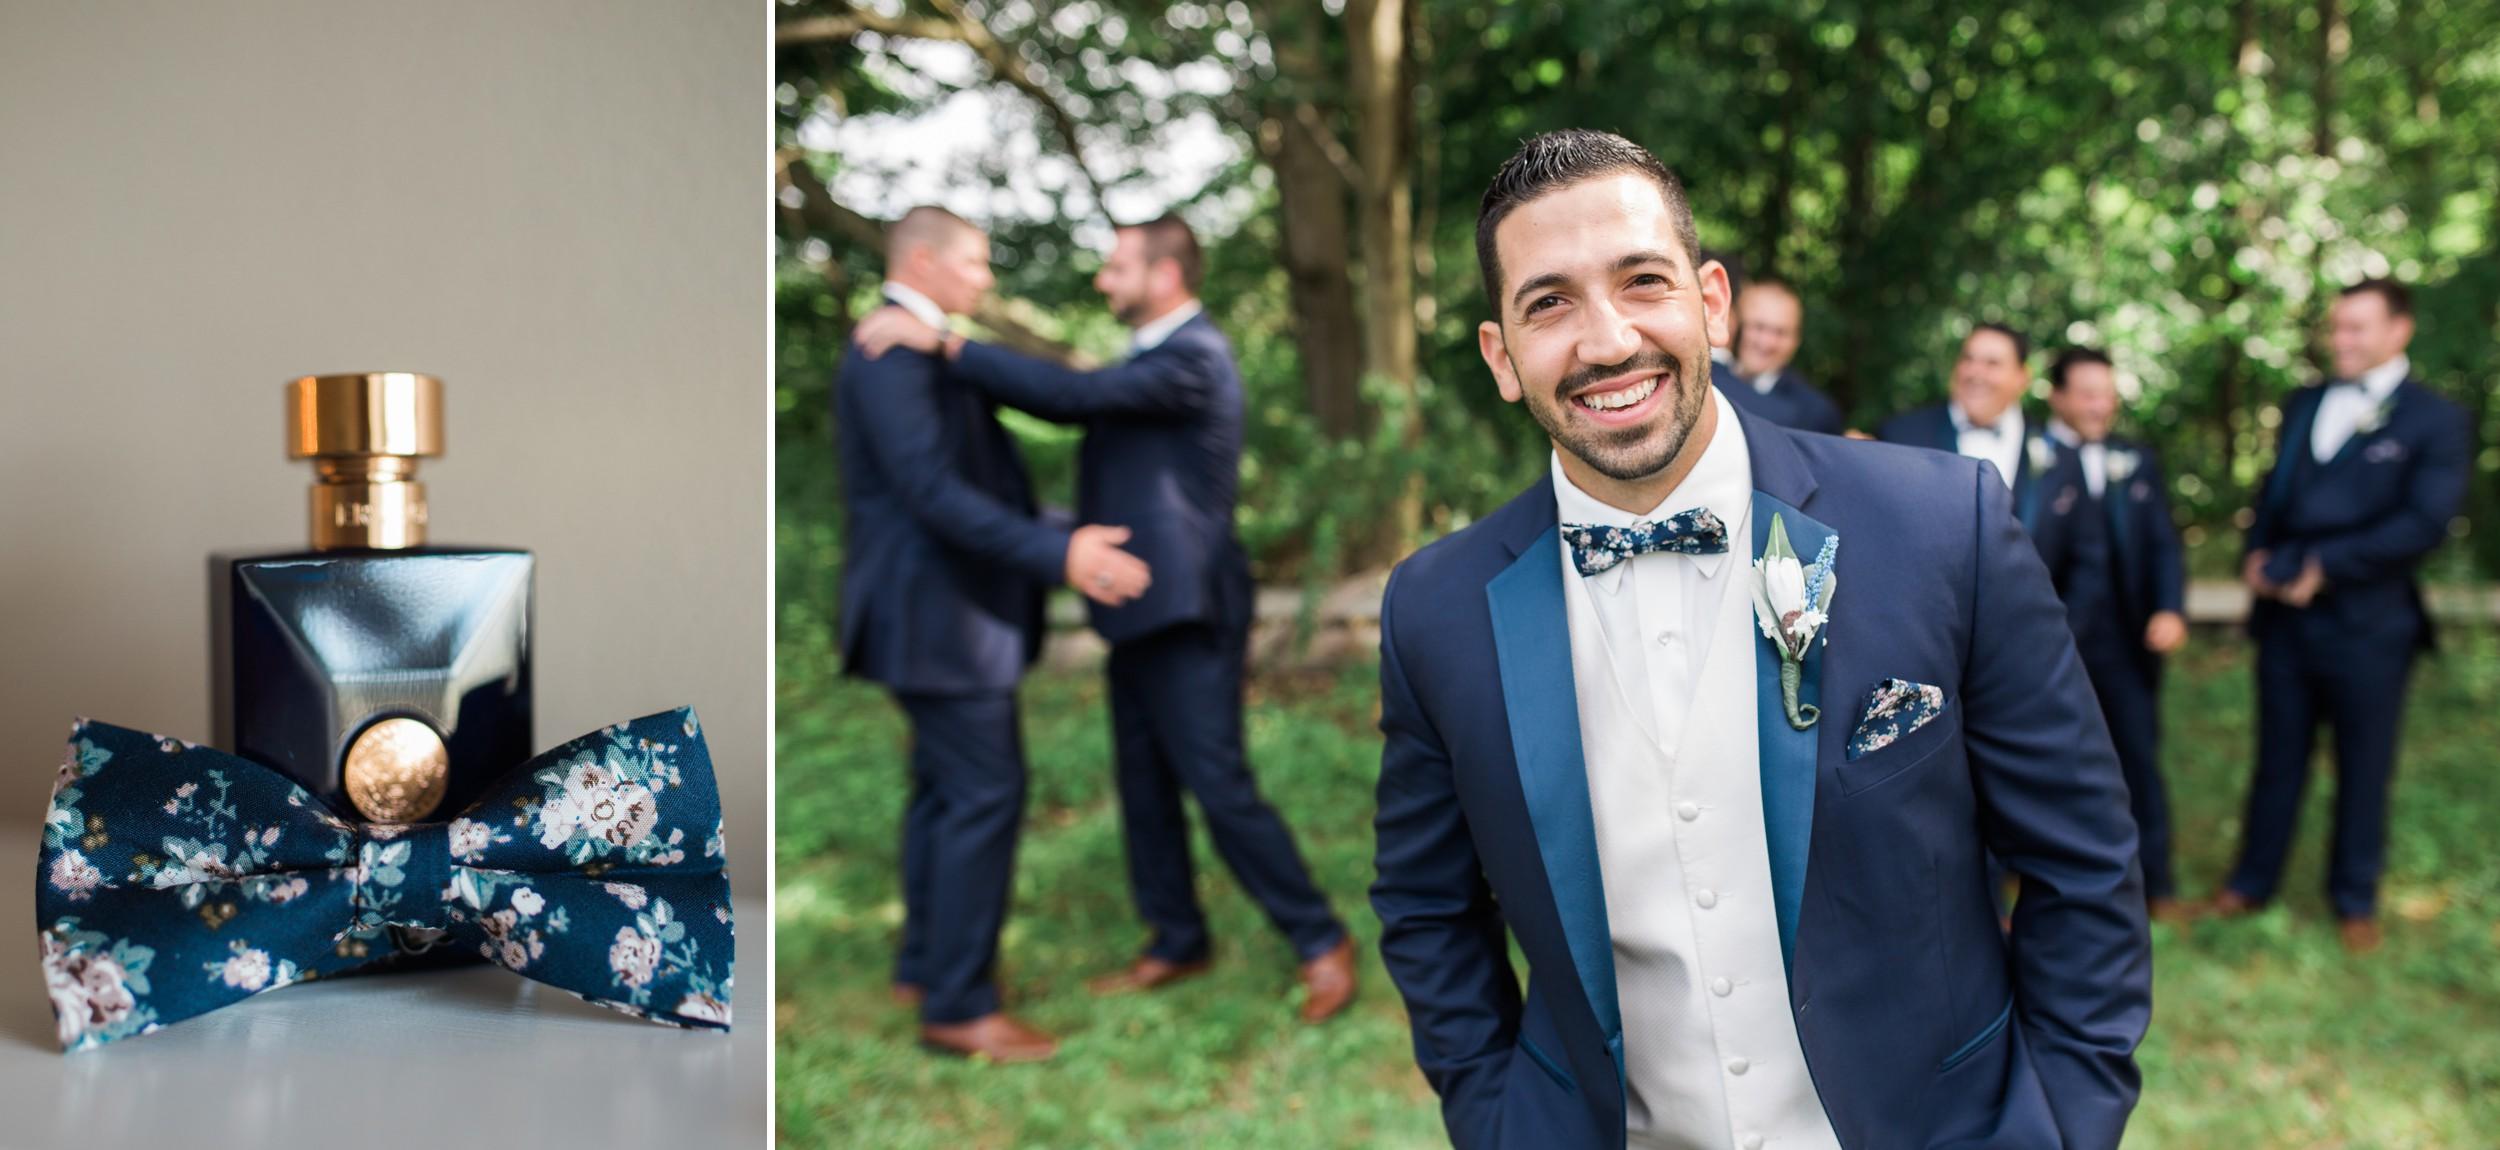 Nick-and-martina-pinelake-vinyards-wedding-columbiana-ohio-tracylynn-photography 11.jpg